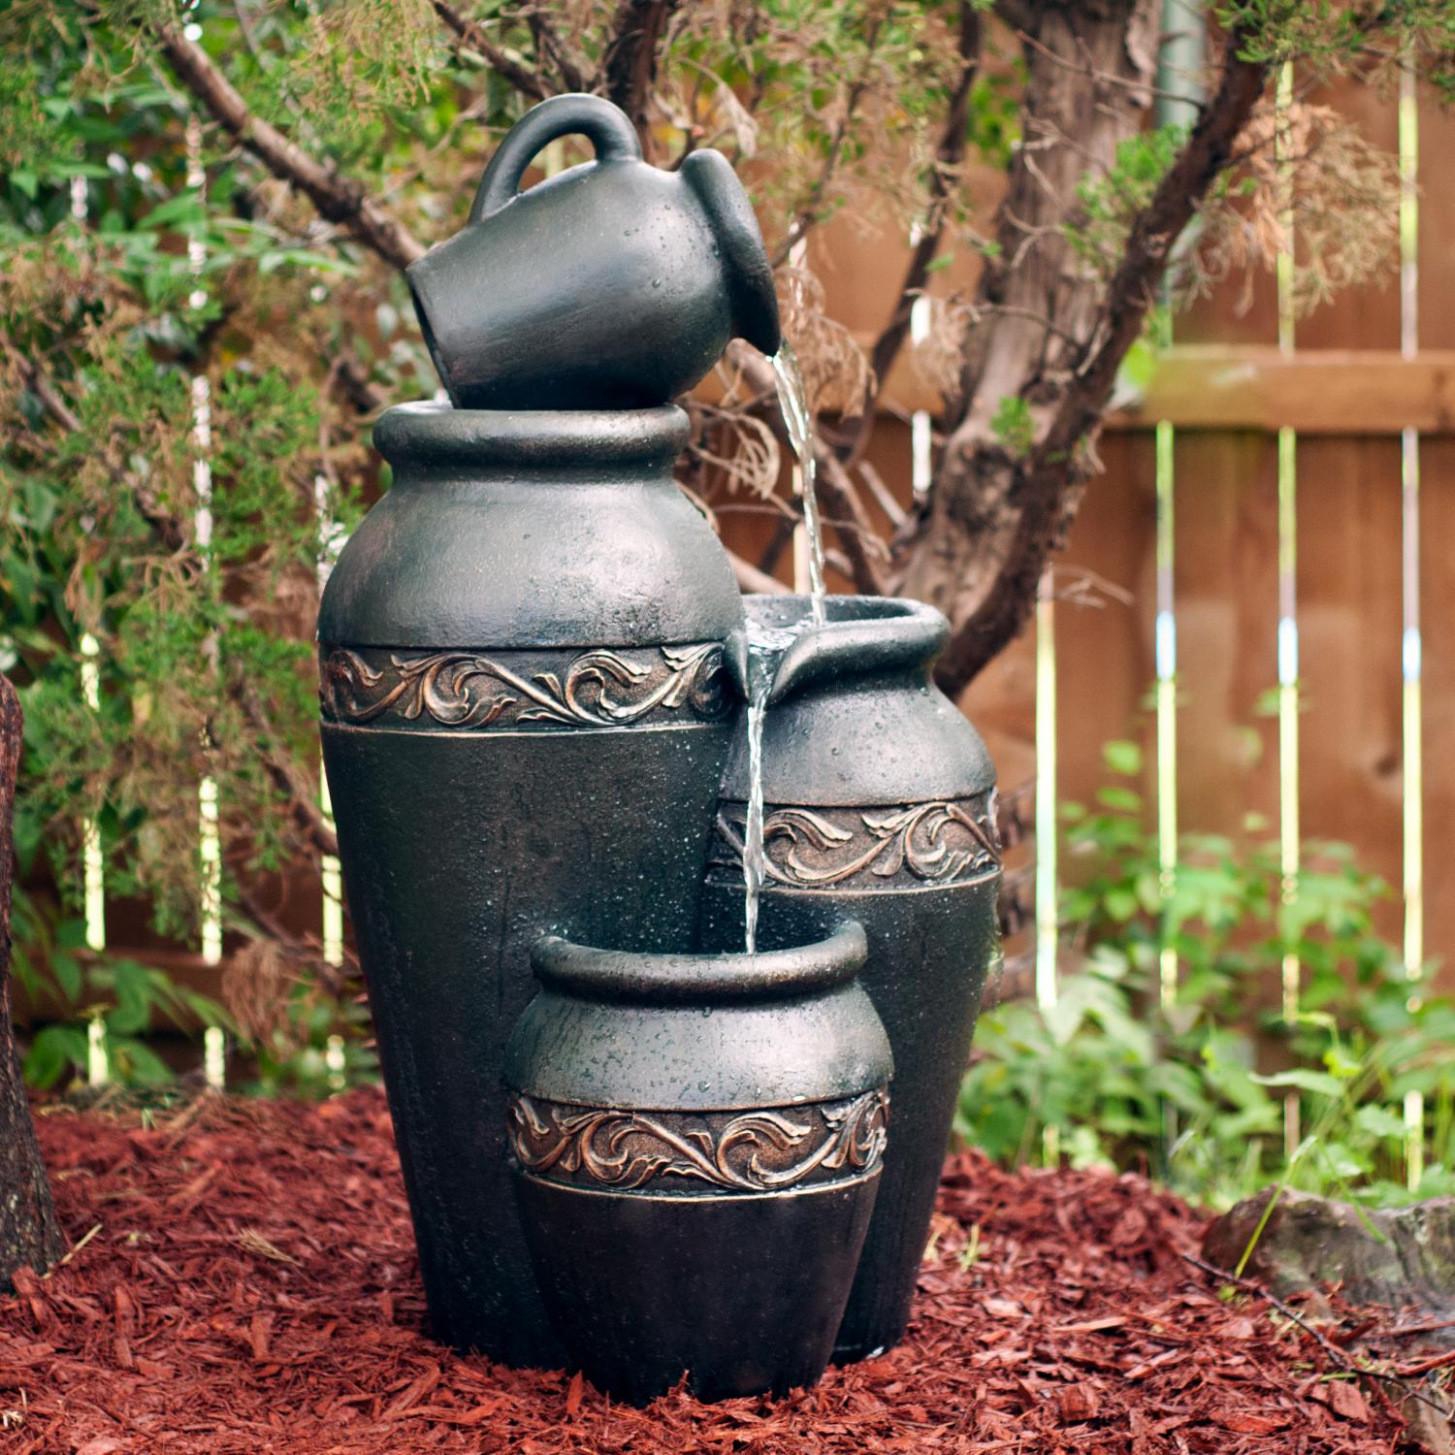 koi fish vase of 29 gorgeous outdoor garden water fountain base grow new creativity within od9644